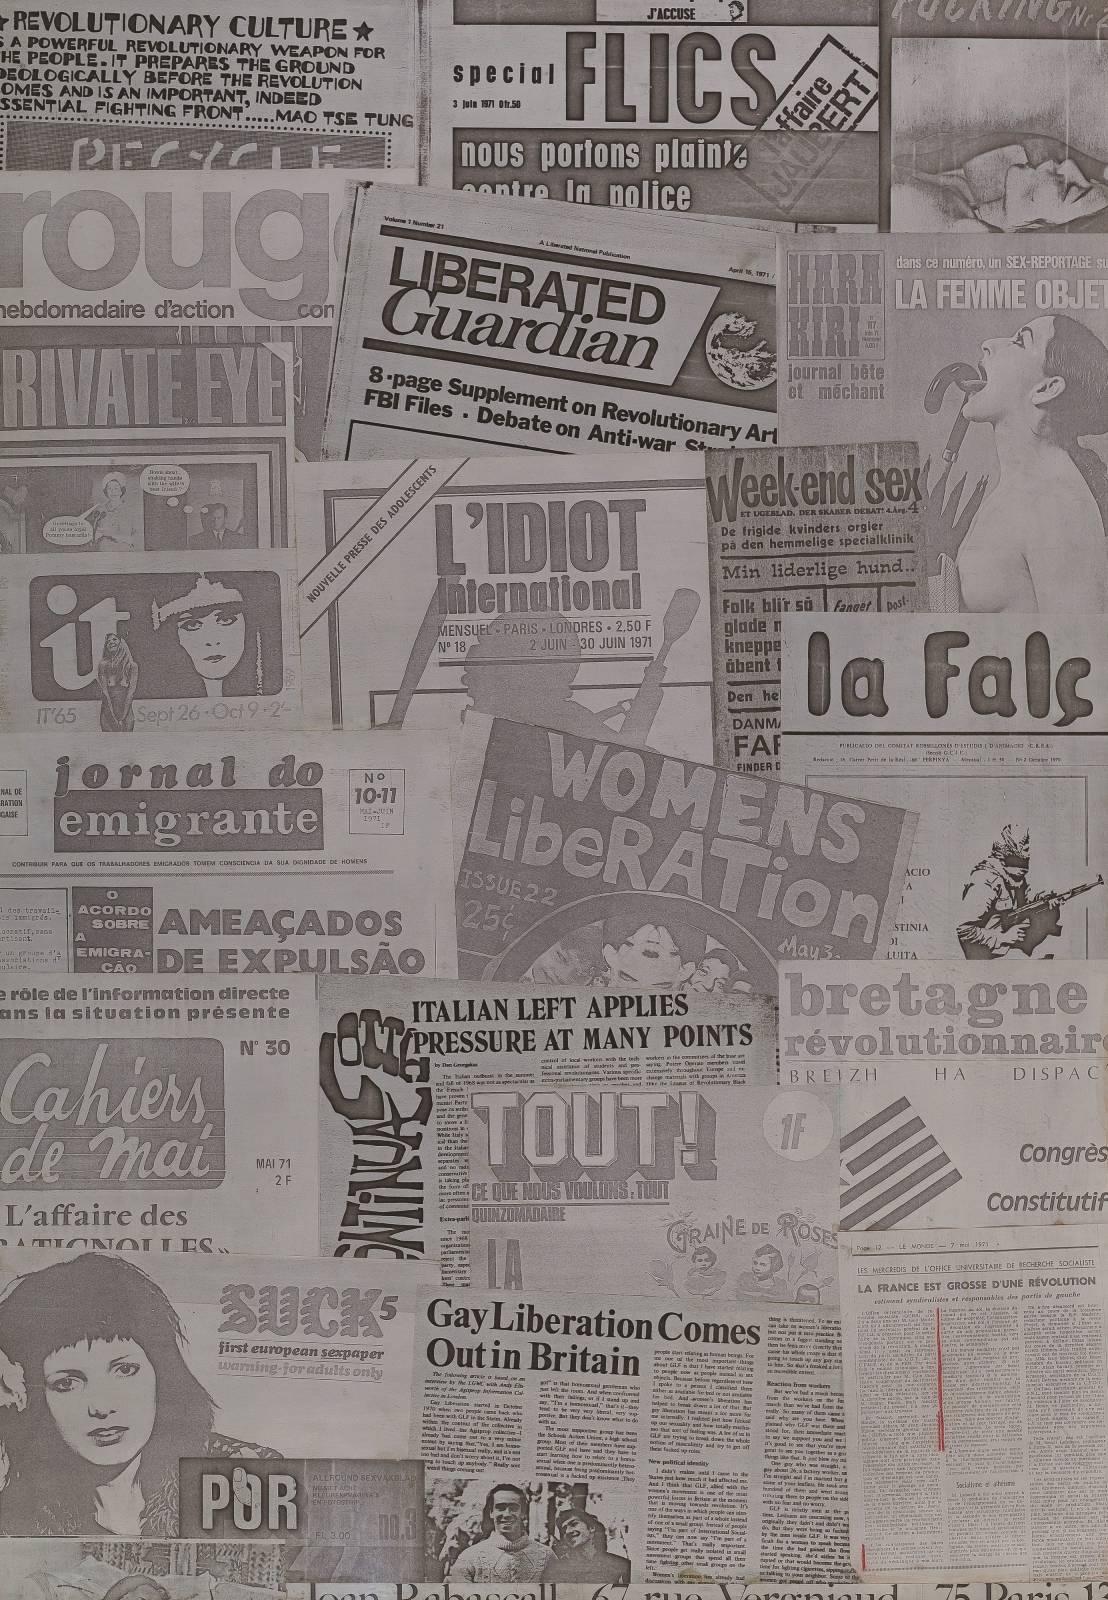 Revolutionary Culture (1971) - Joan Rabascall